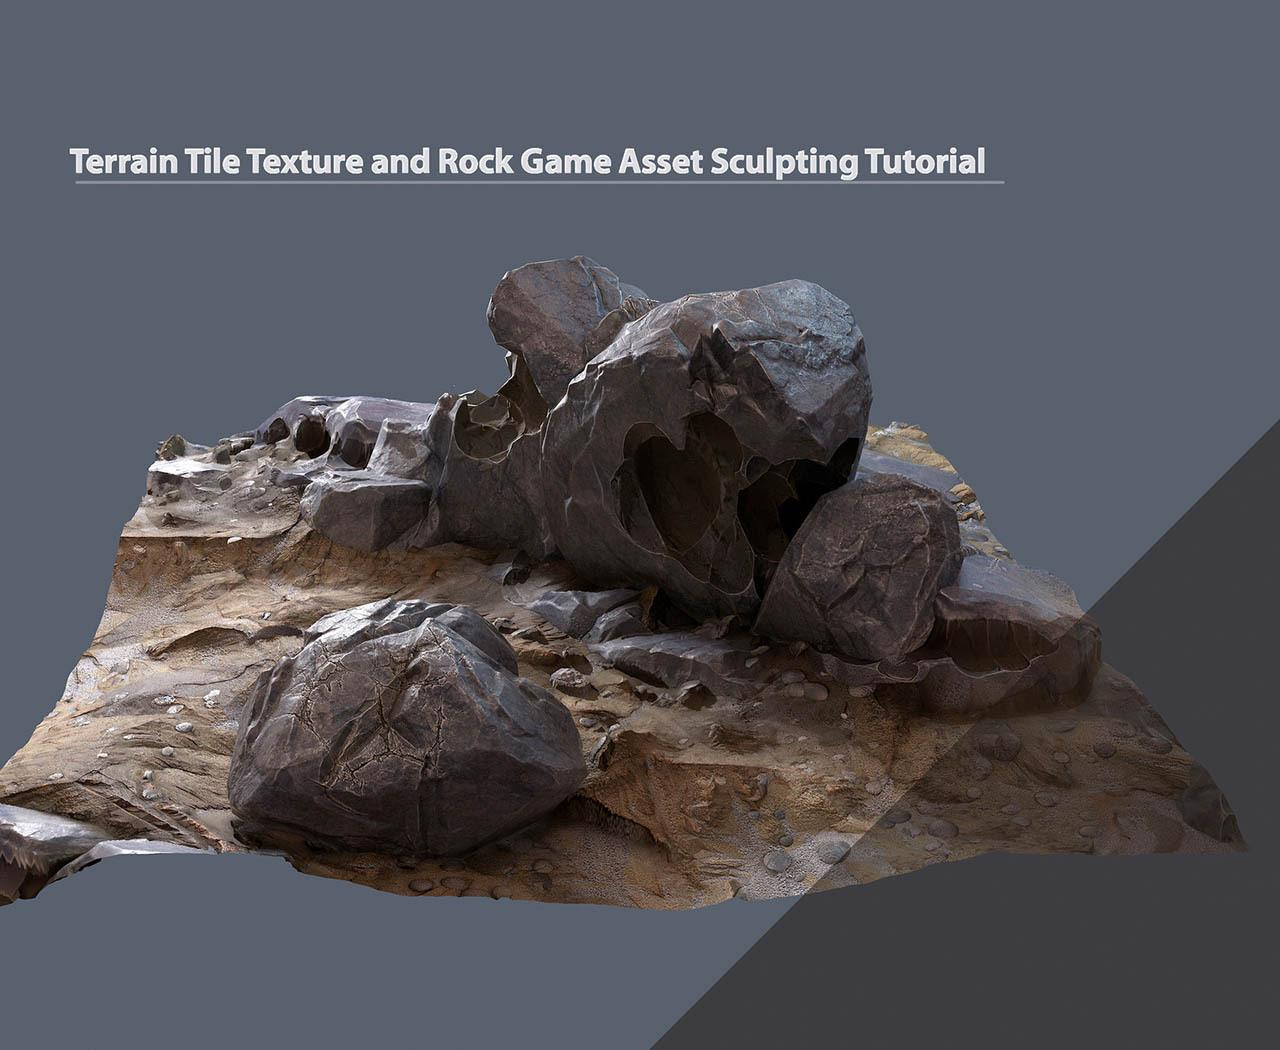 游戏石头地形模型材质预设教程 Terrain Tile Texture and Rock Game Asset Sculpting Tutorial